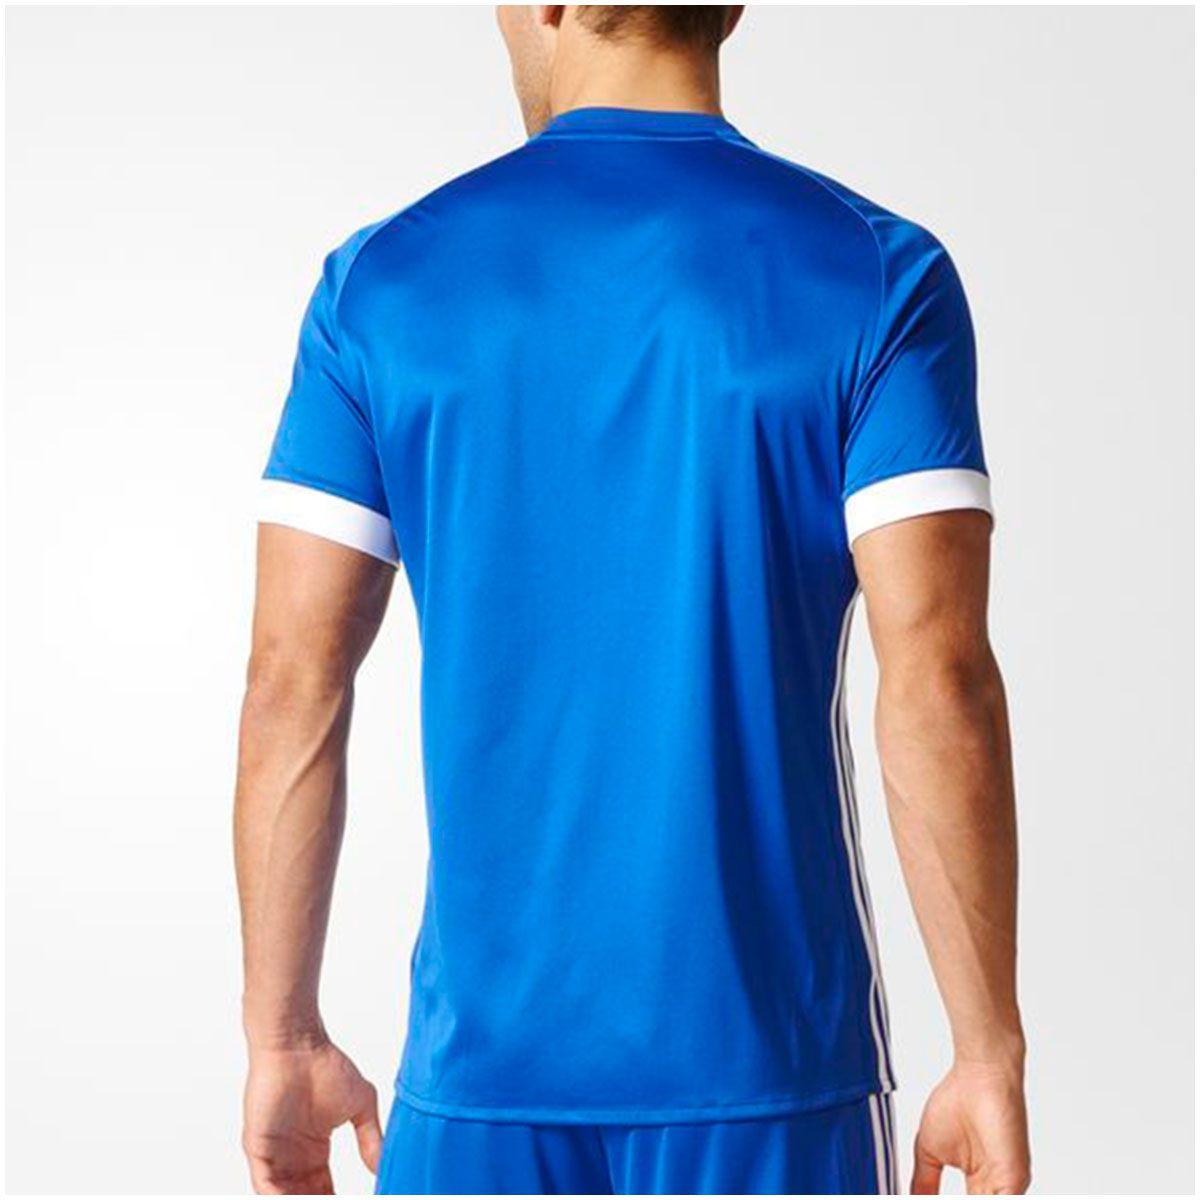 Camisa Universidad do Chile Home Adidas 2017